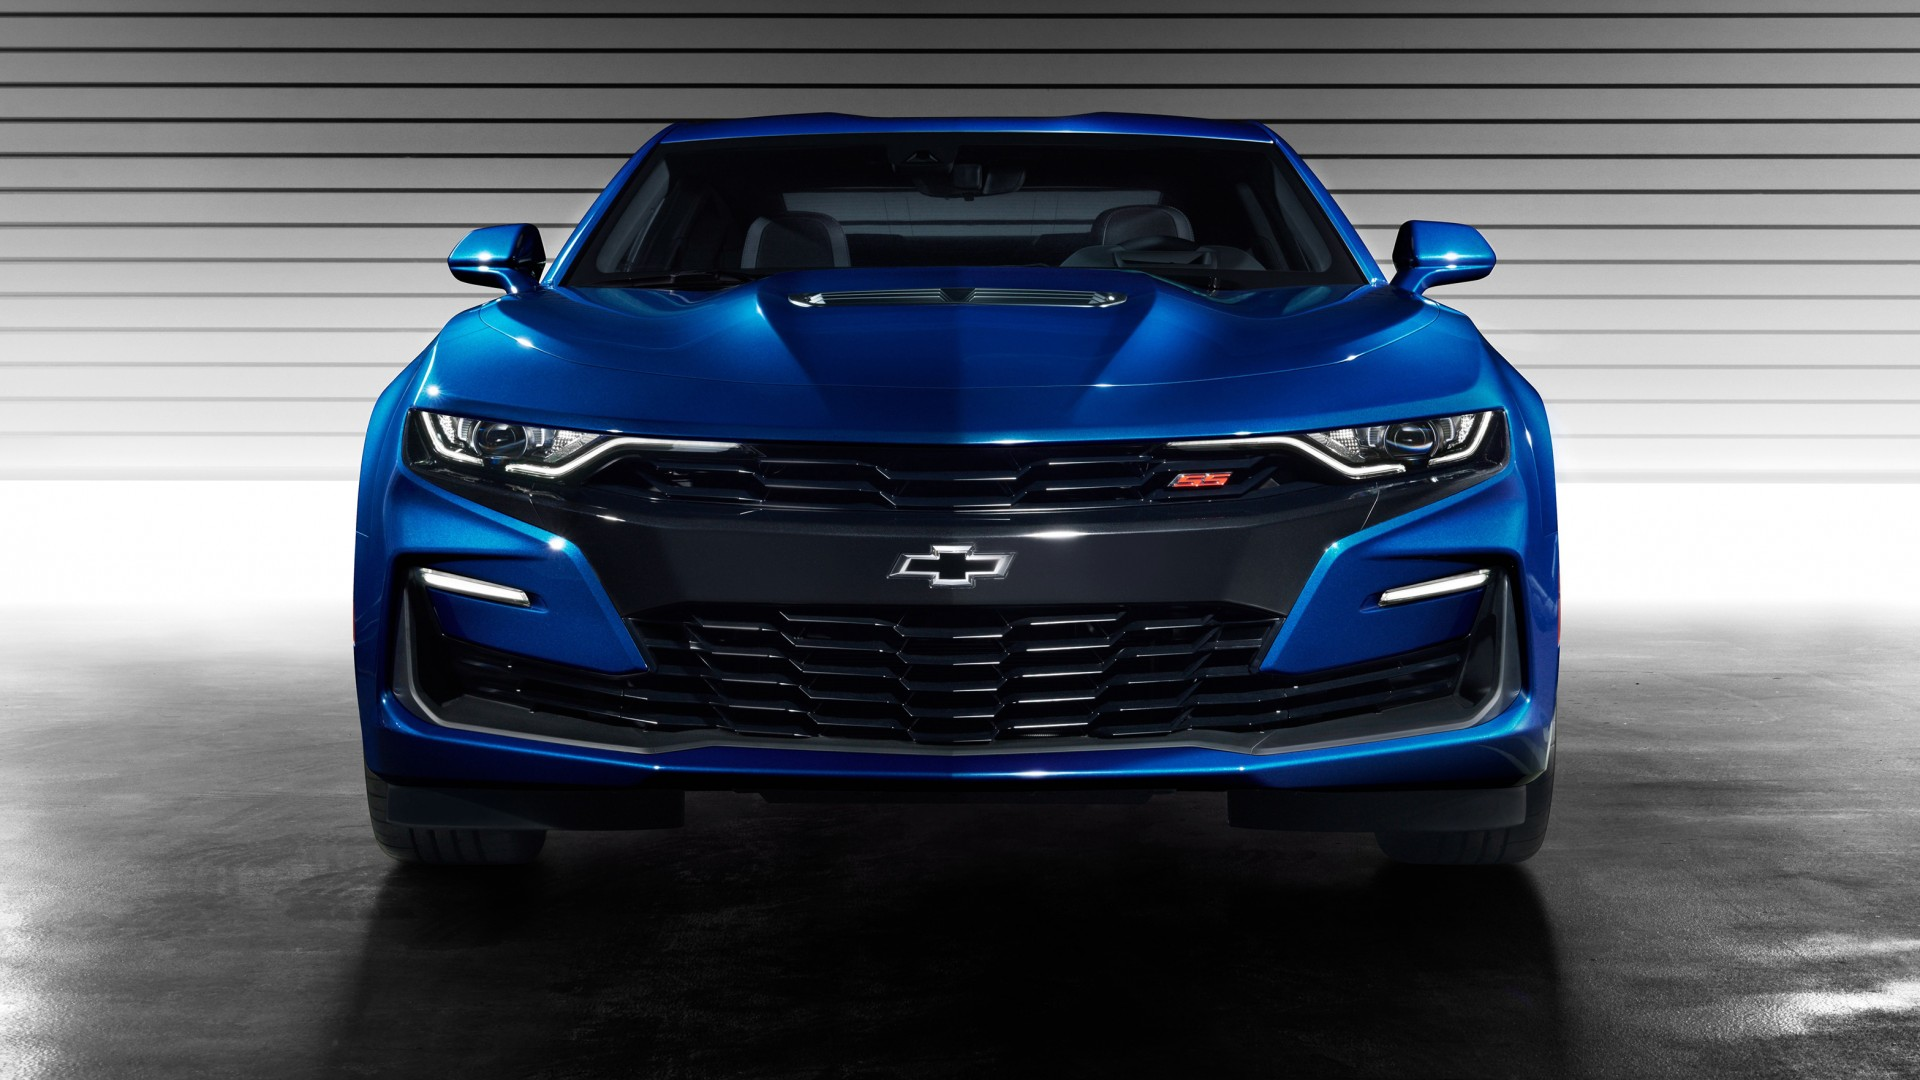 2019 Chevrolet Camaro SS Wallpaper | HD Car Wallpapers ...